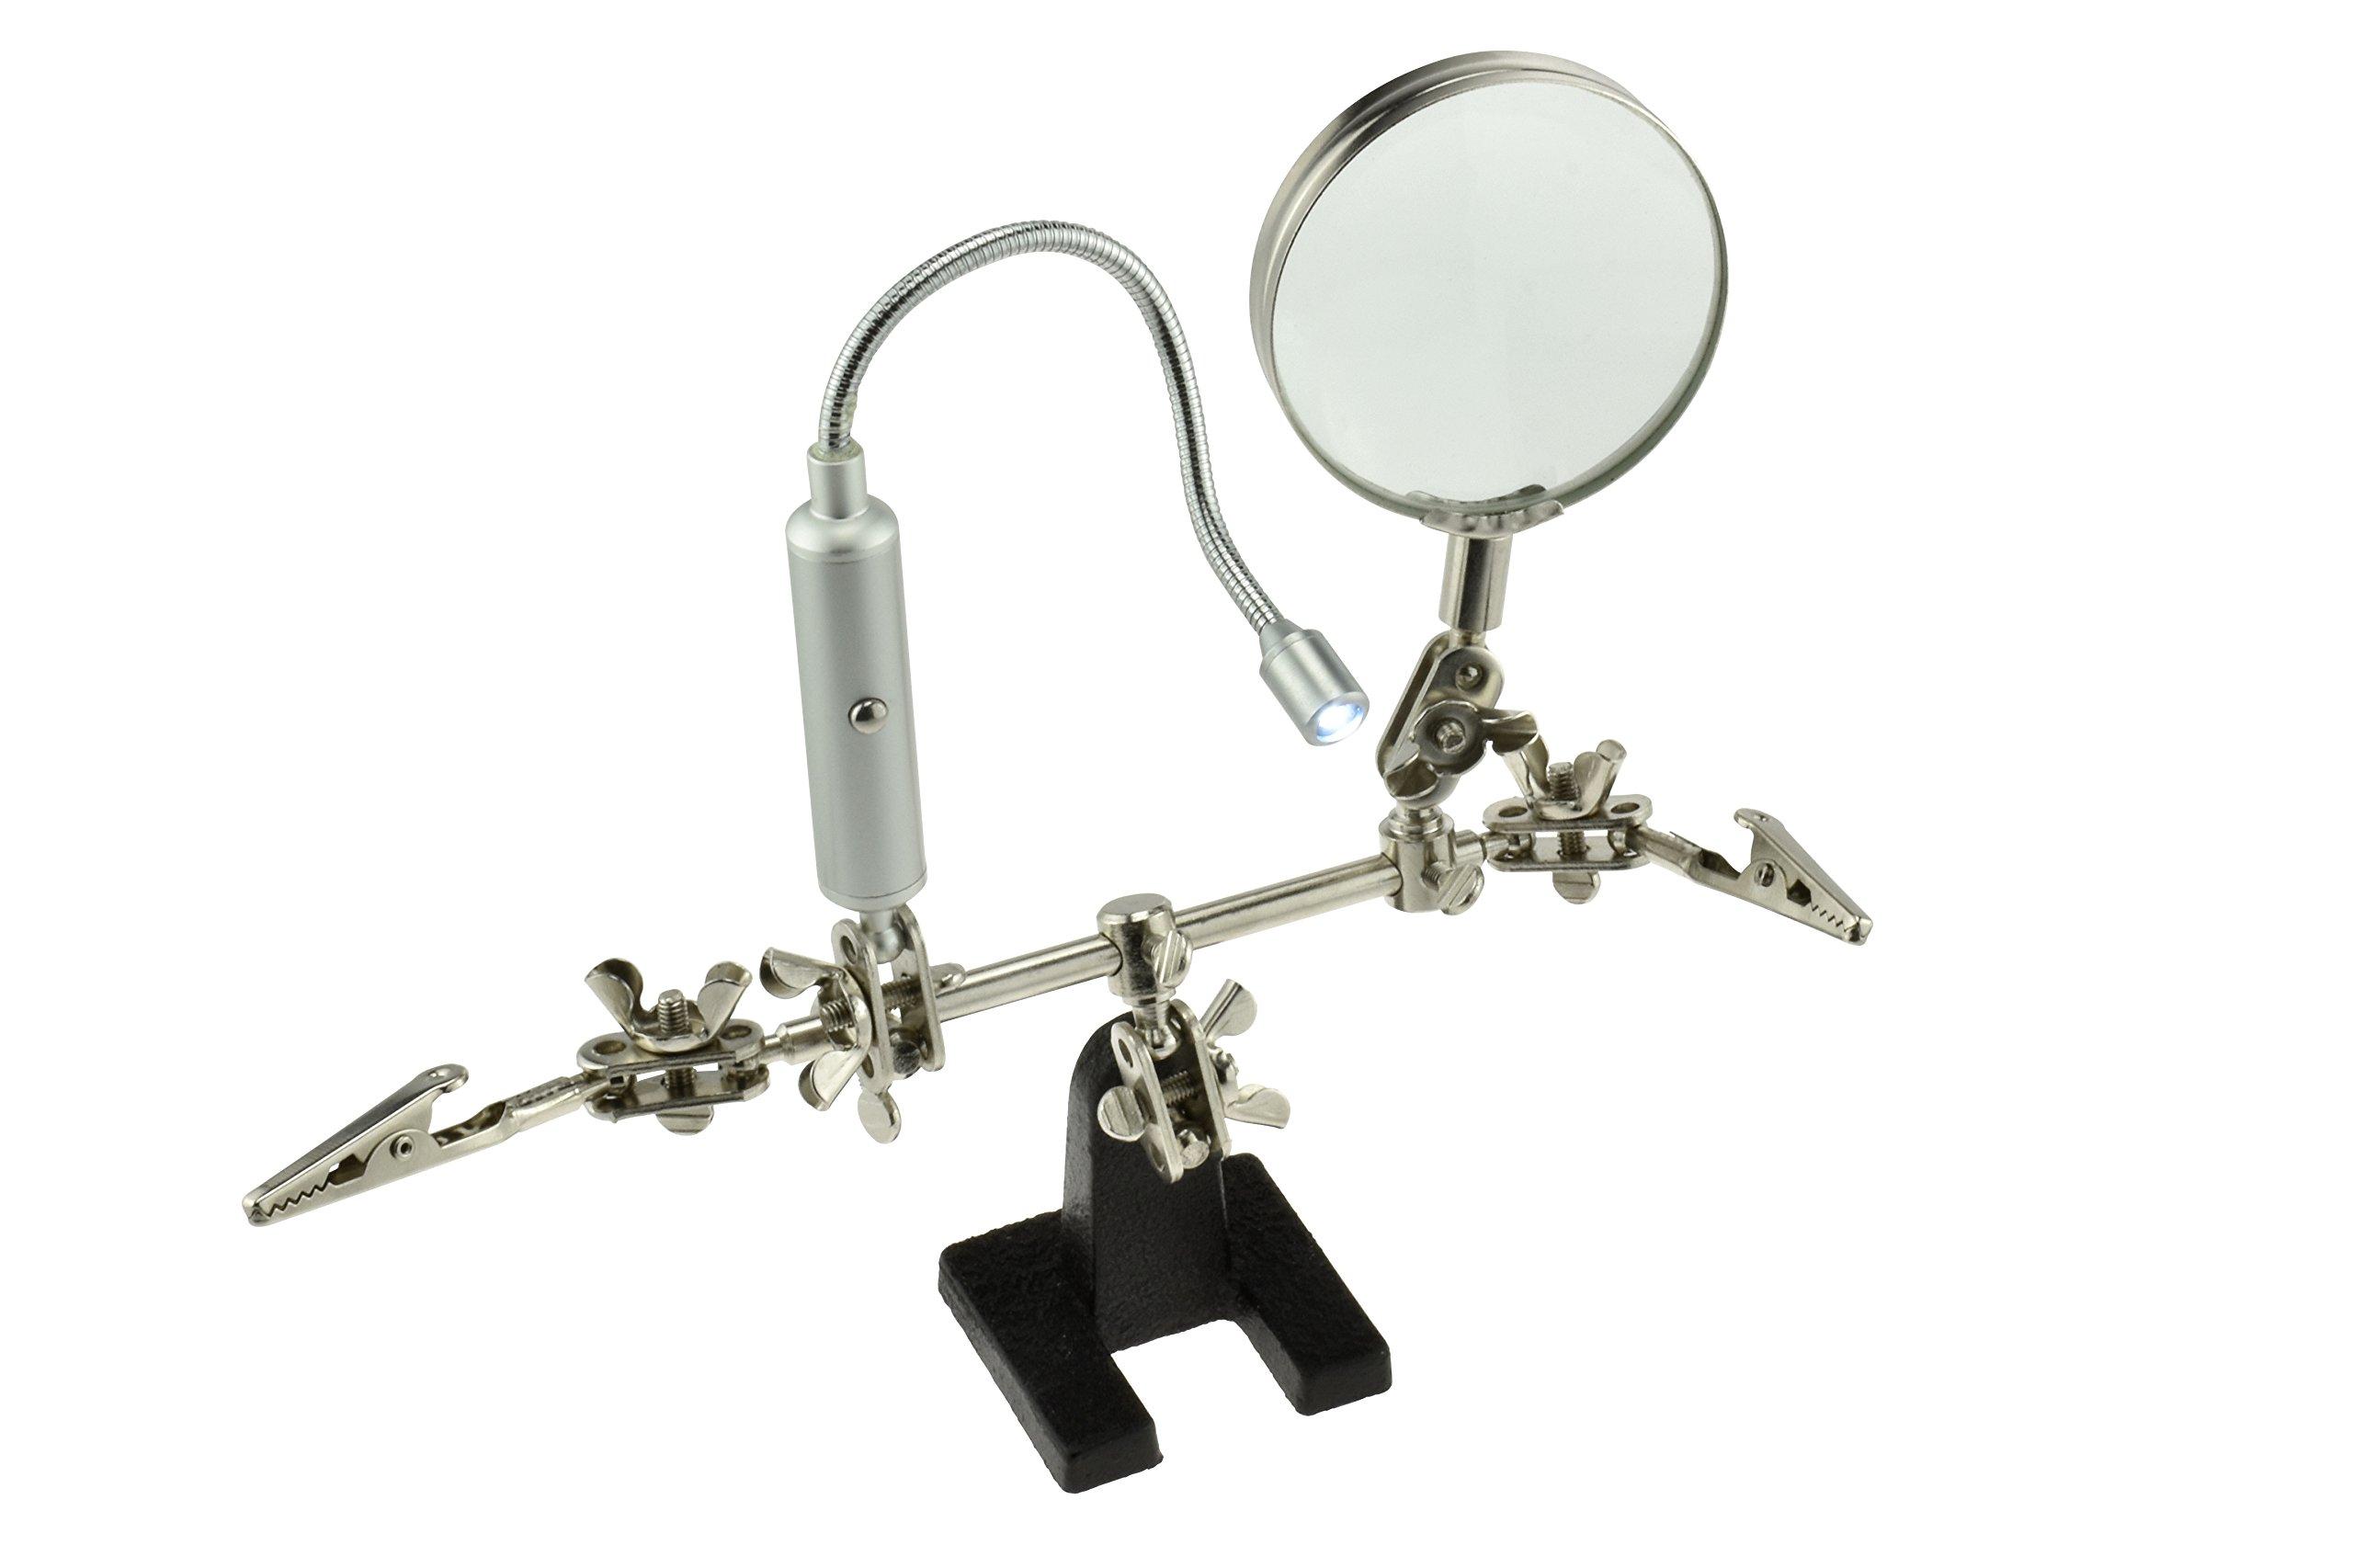 SE MZ1013FL Magnifier Flexible Flashlight